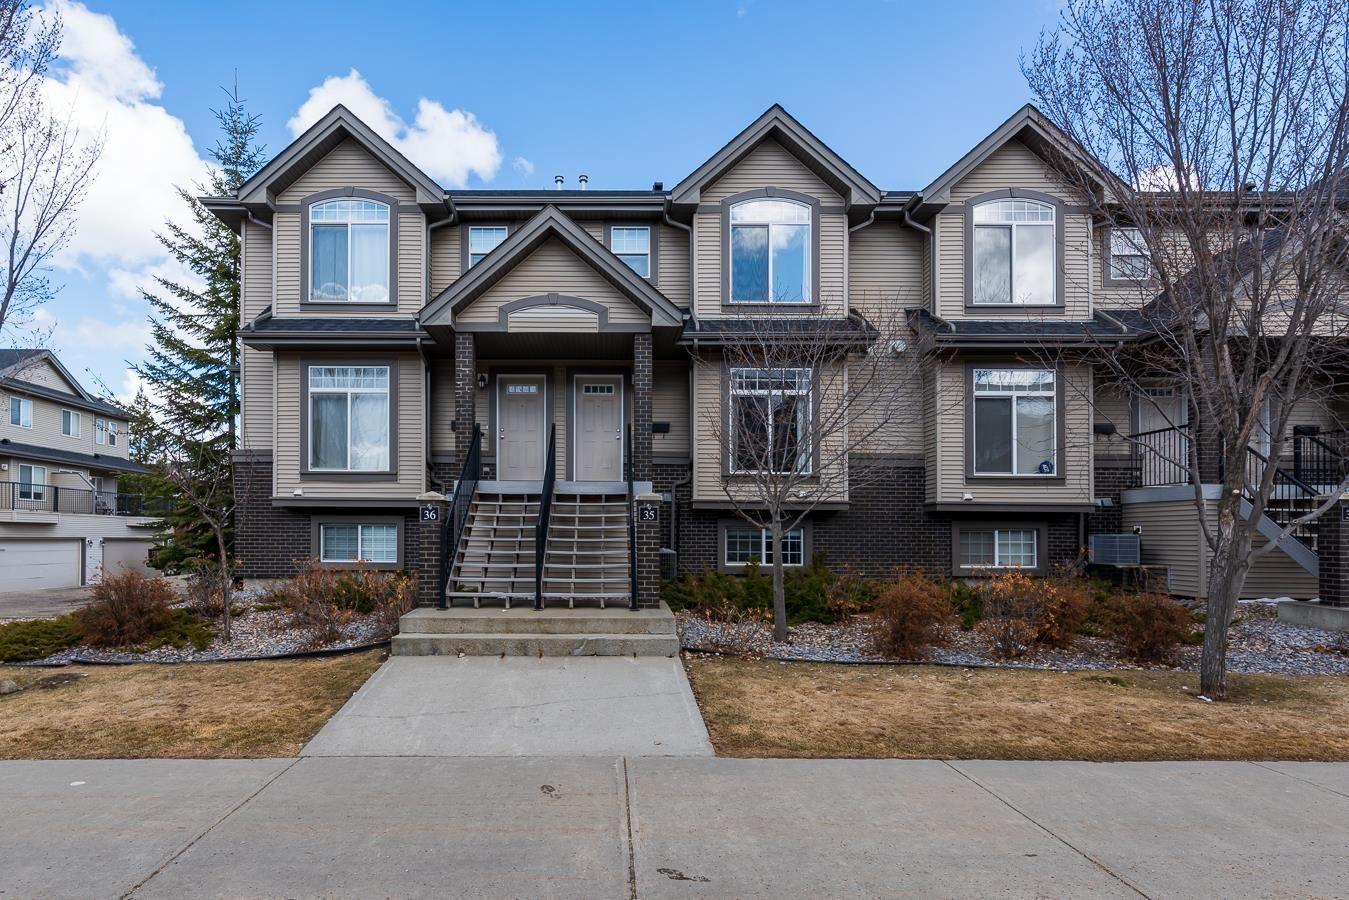 Main Photo: 35 4731 TERWILLEGAR Common in Edmonton: Zone 14 Townhouse for sale : MLS®# E4254467